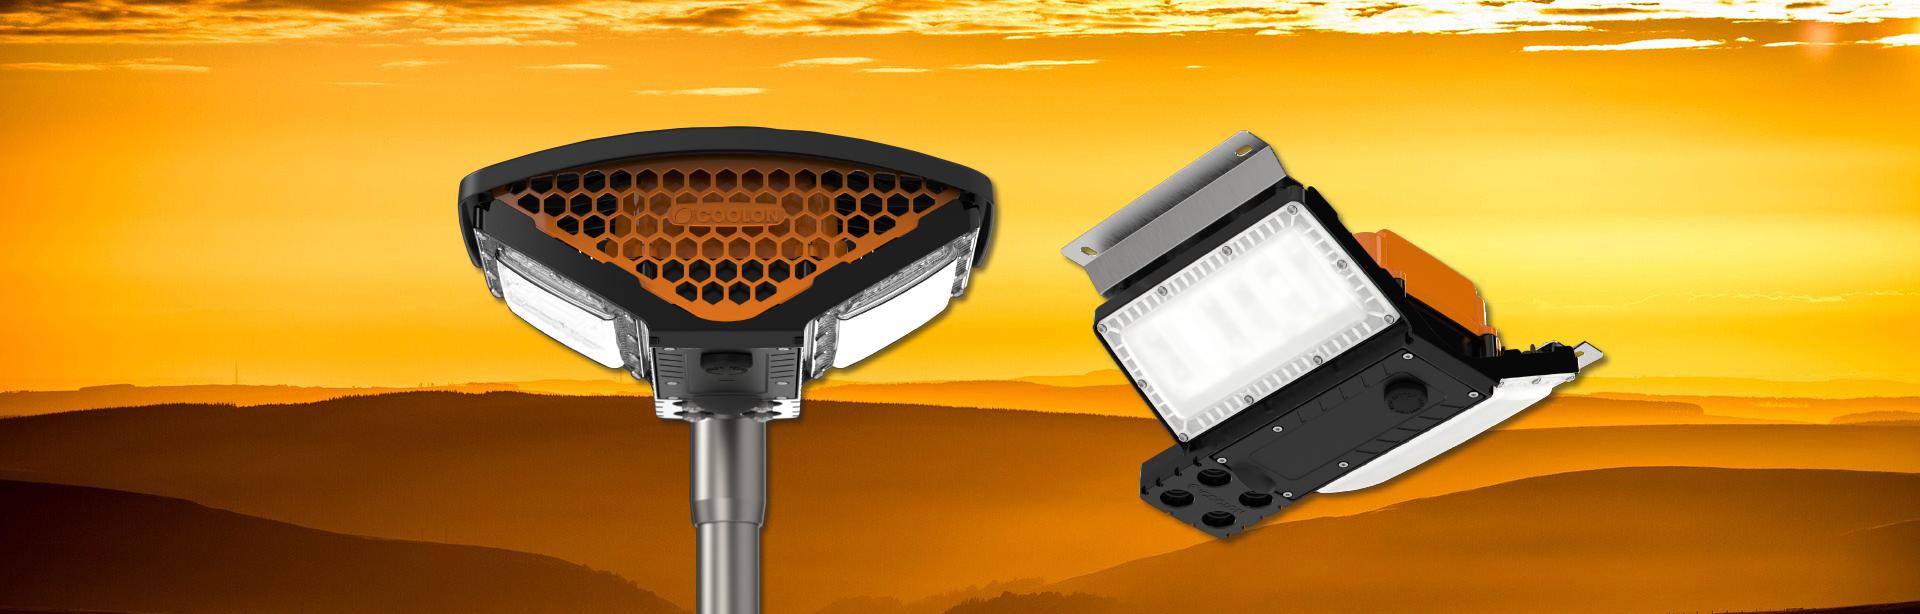 The EMDLK2/EMTNR2 is both a highly reliableconveyor/tunnel light and smart backup emergency light.